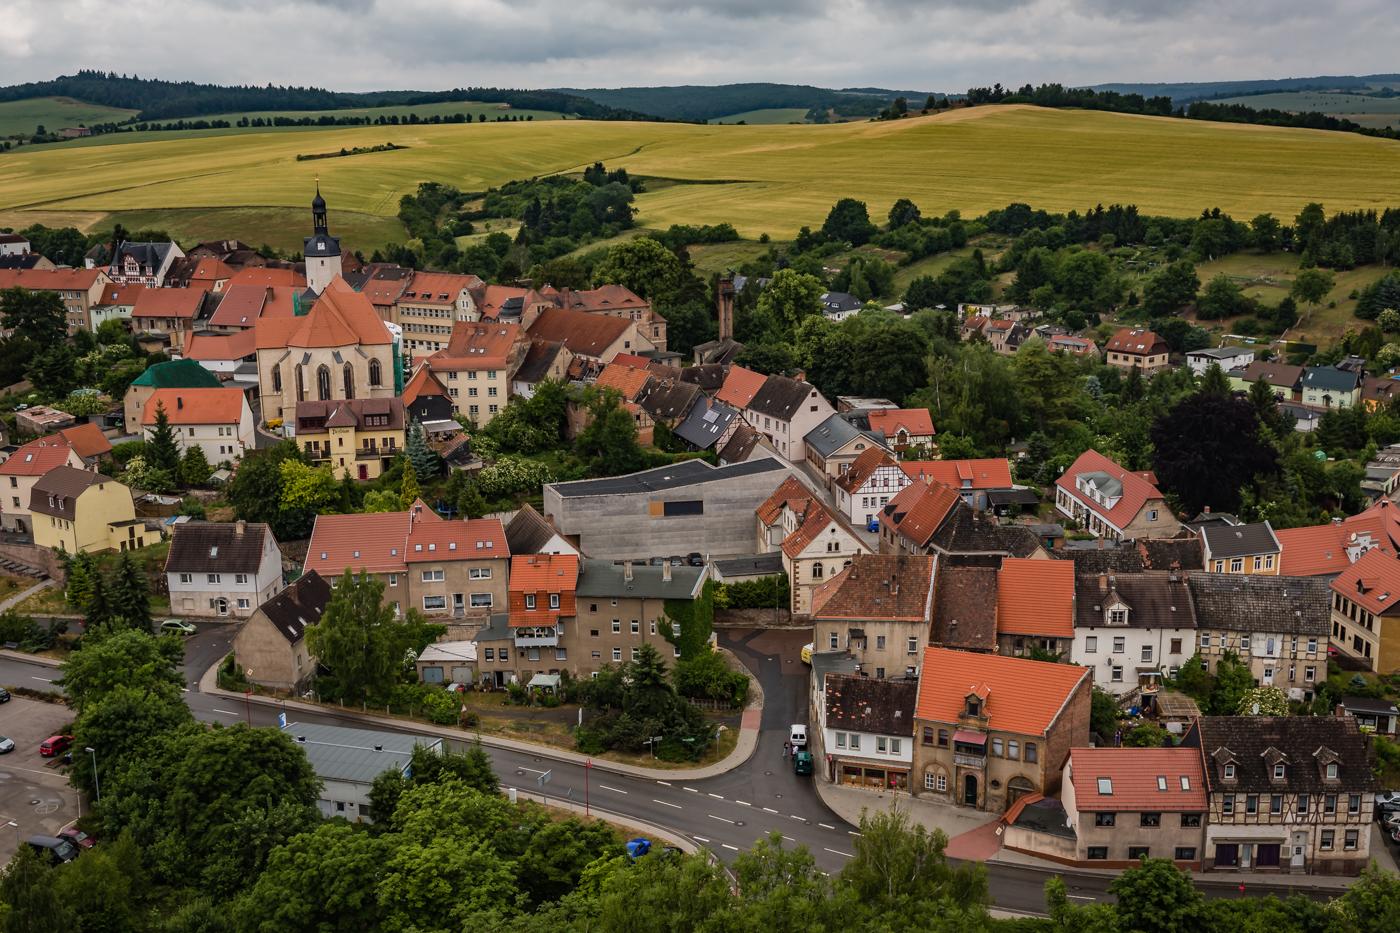 Blick auf Mansfeld vom Schloss